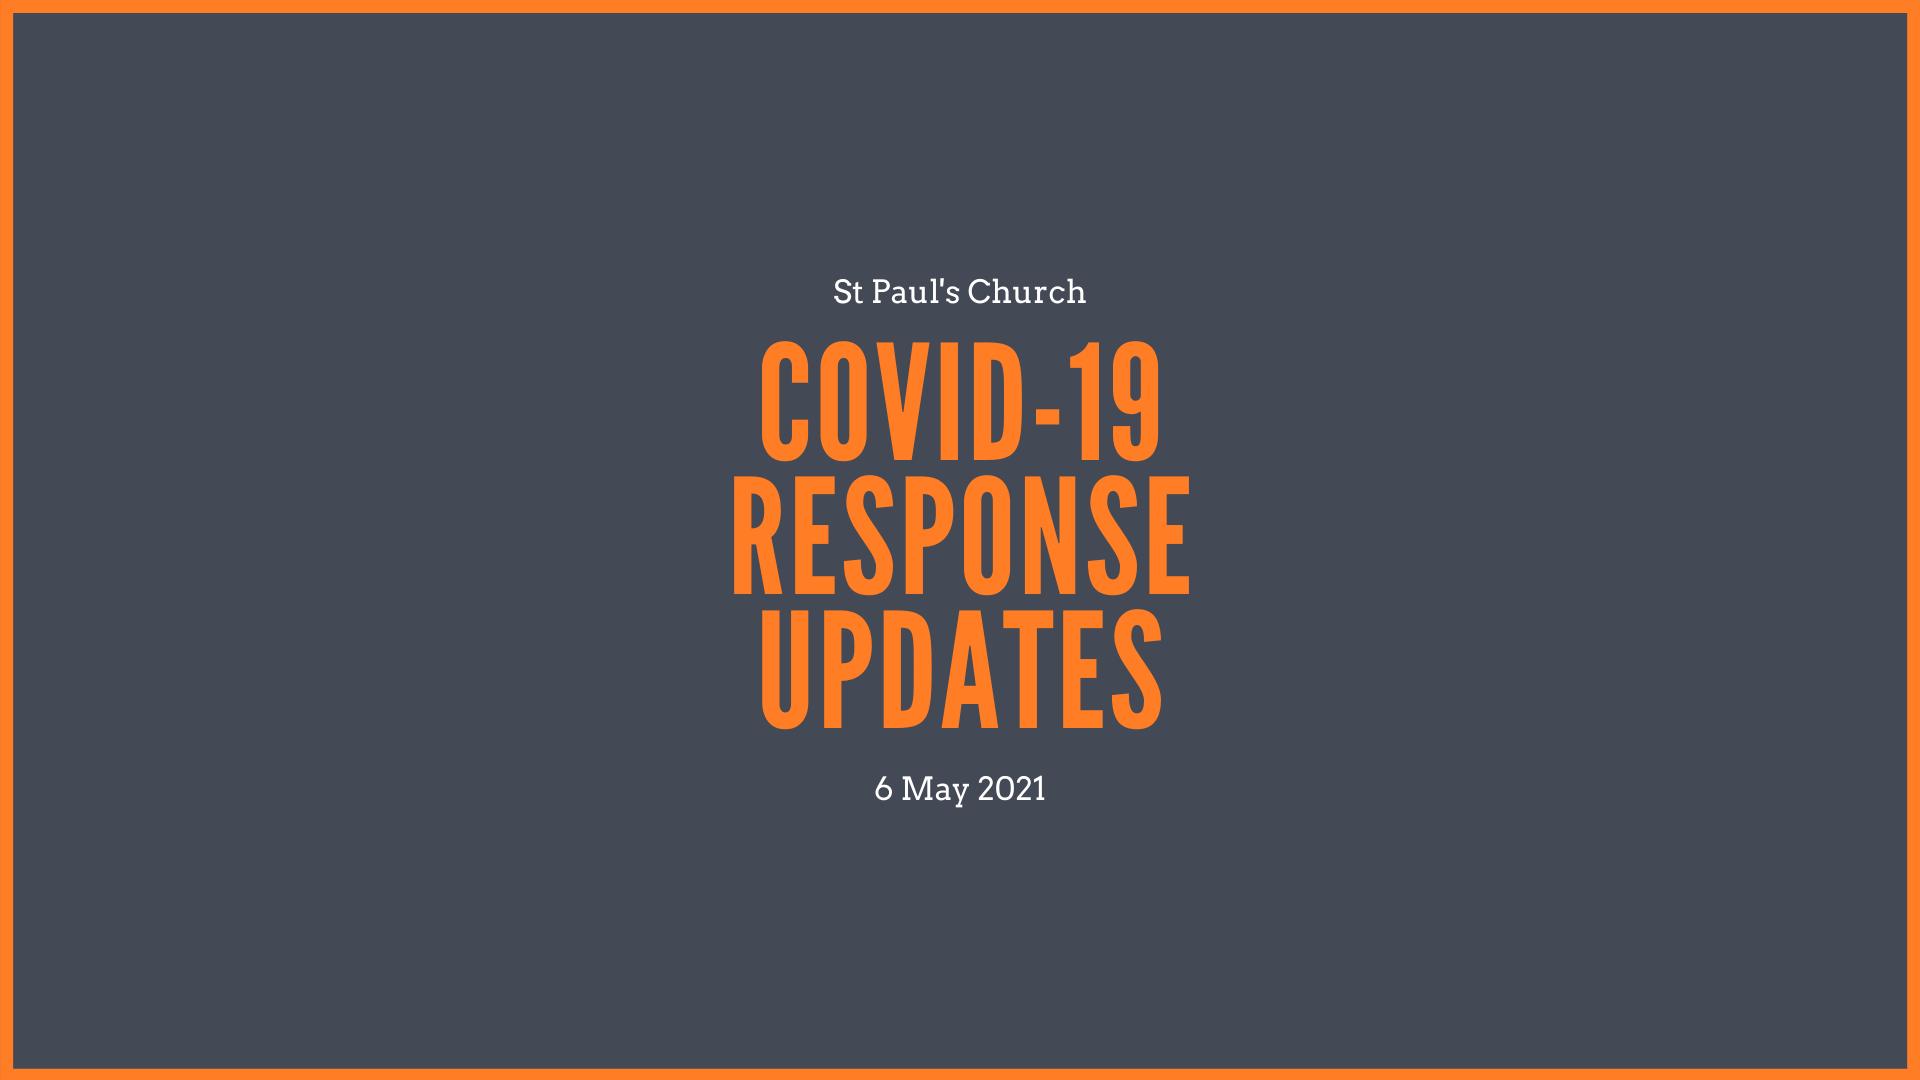 COVID-19 Response Updates